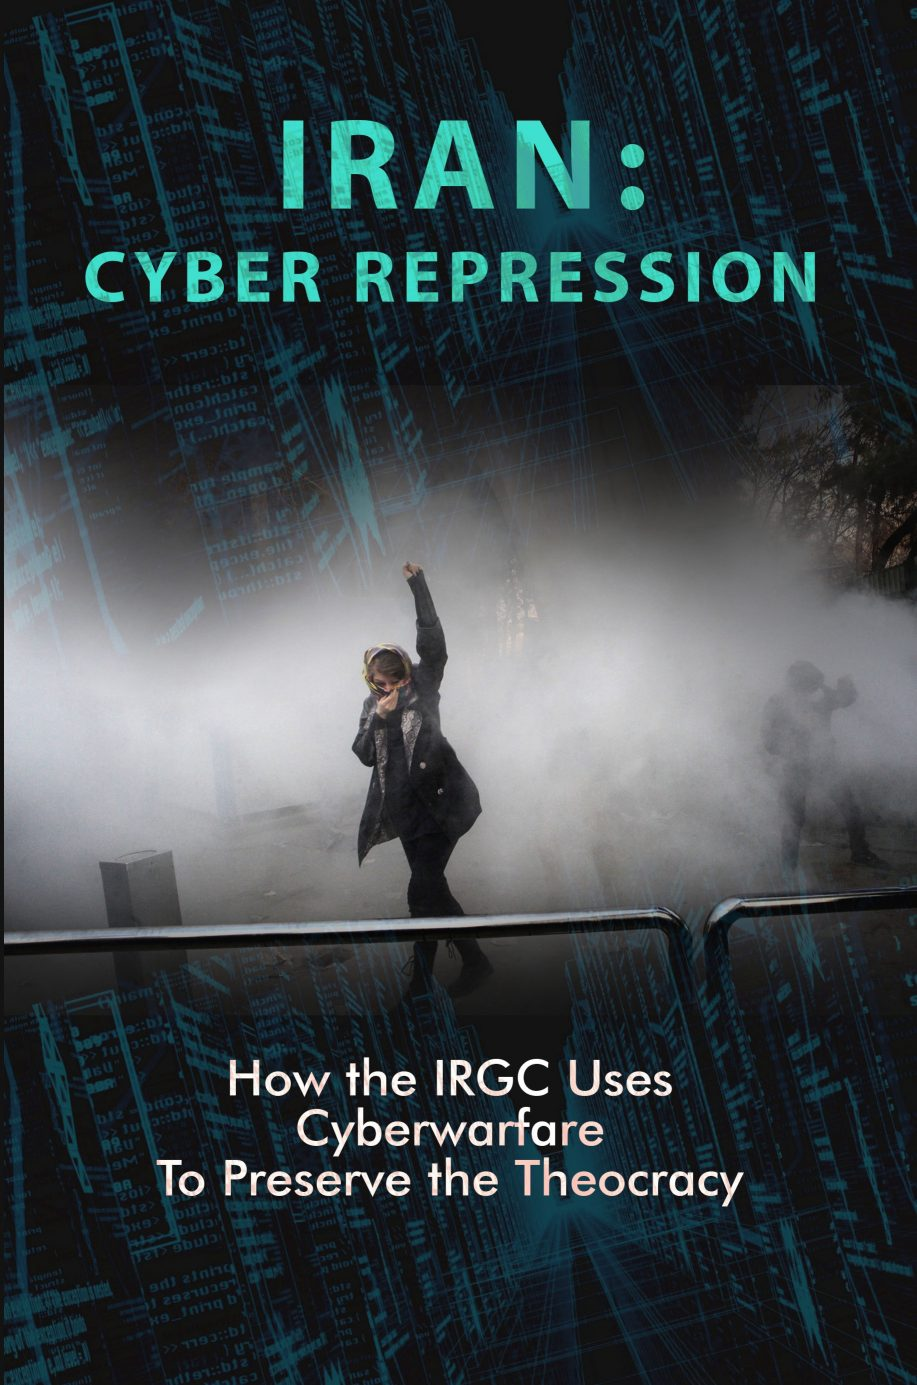 How the IRGC Uses Cyberwarfare to Preserve the Theocracy